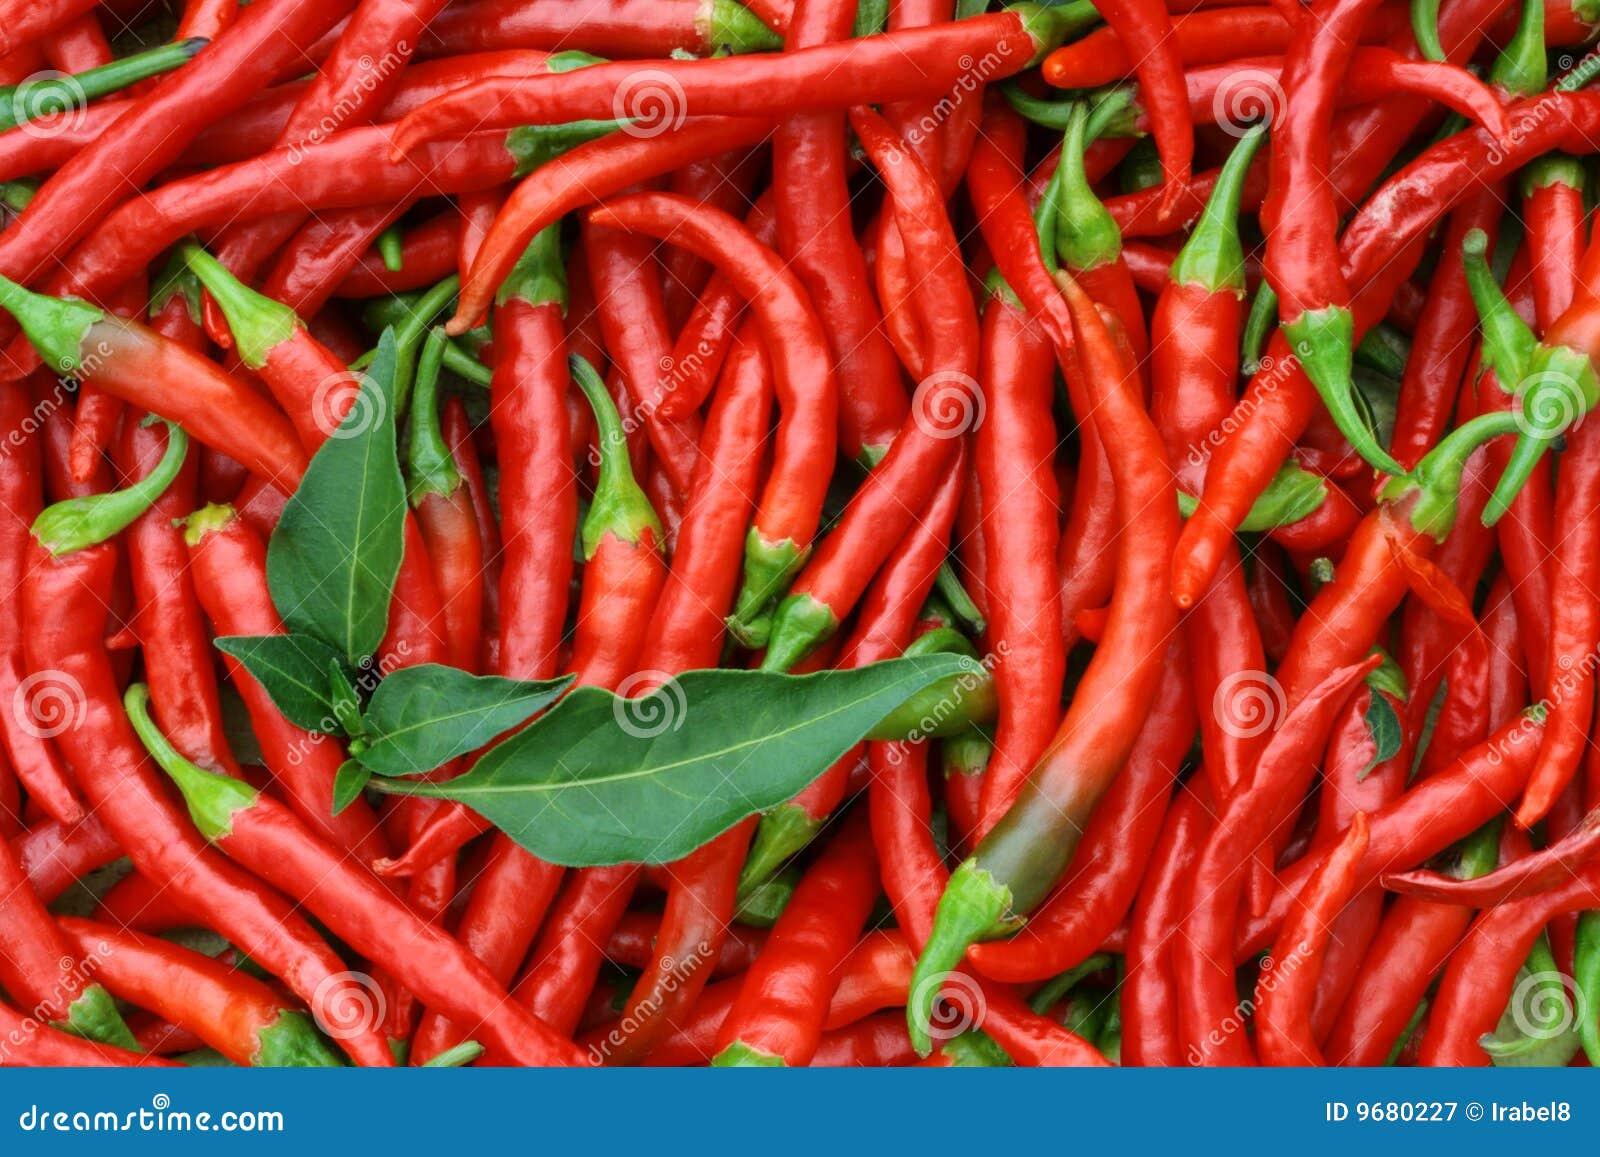 red chili peppers thailand stock photo cartoondealer. Black Bedroom Furniture Sets. Home Design Ideas